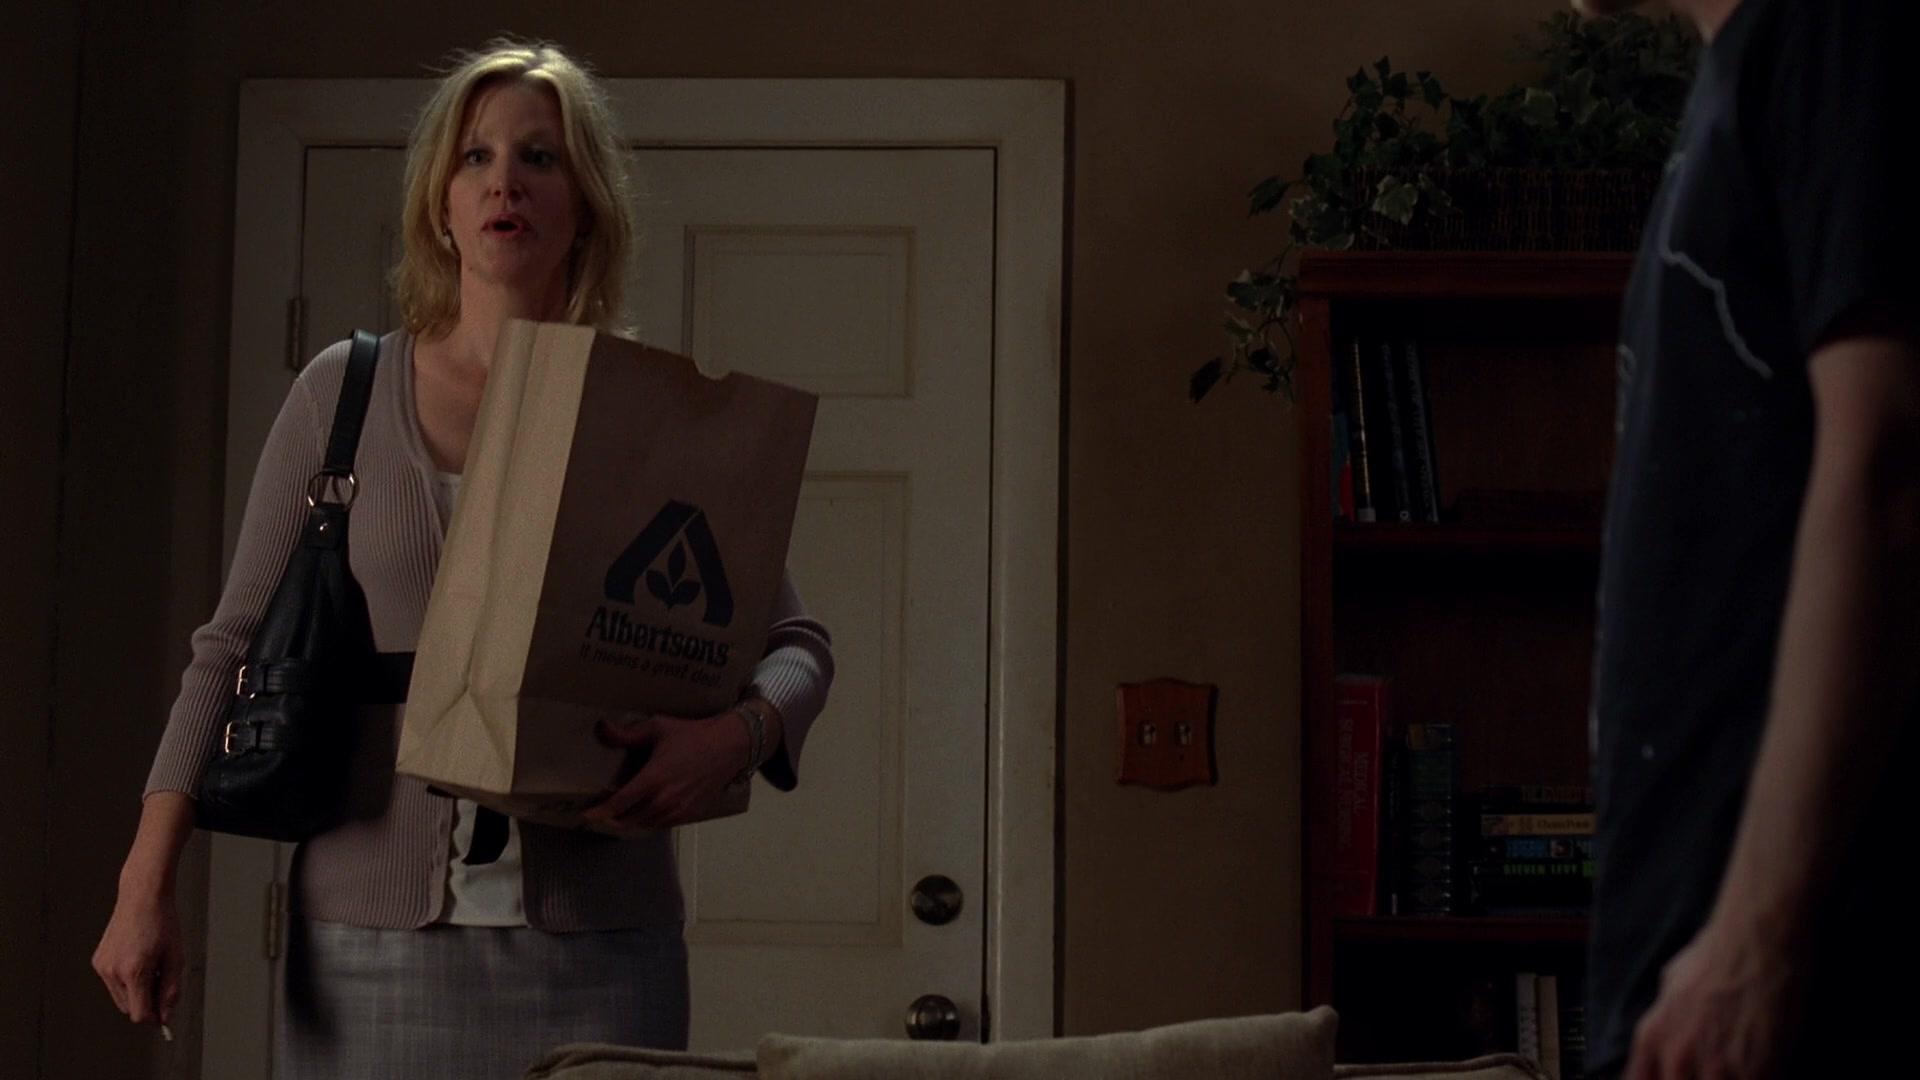 Anna gunn breaking bad season 5